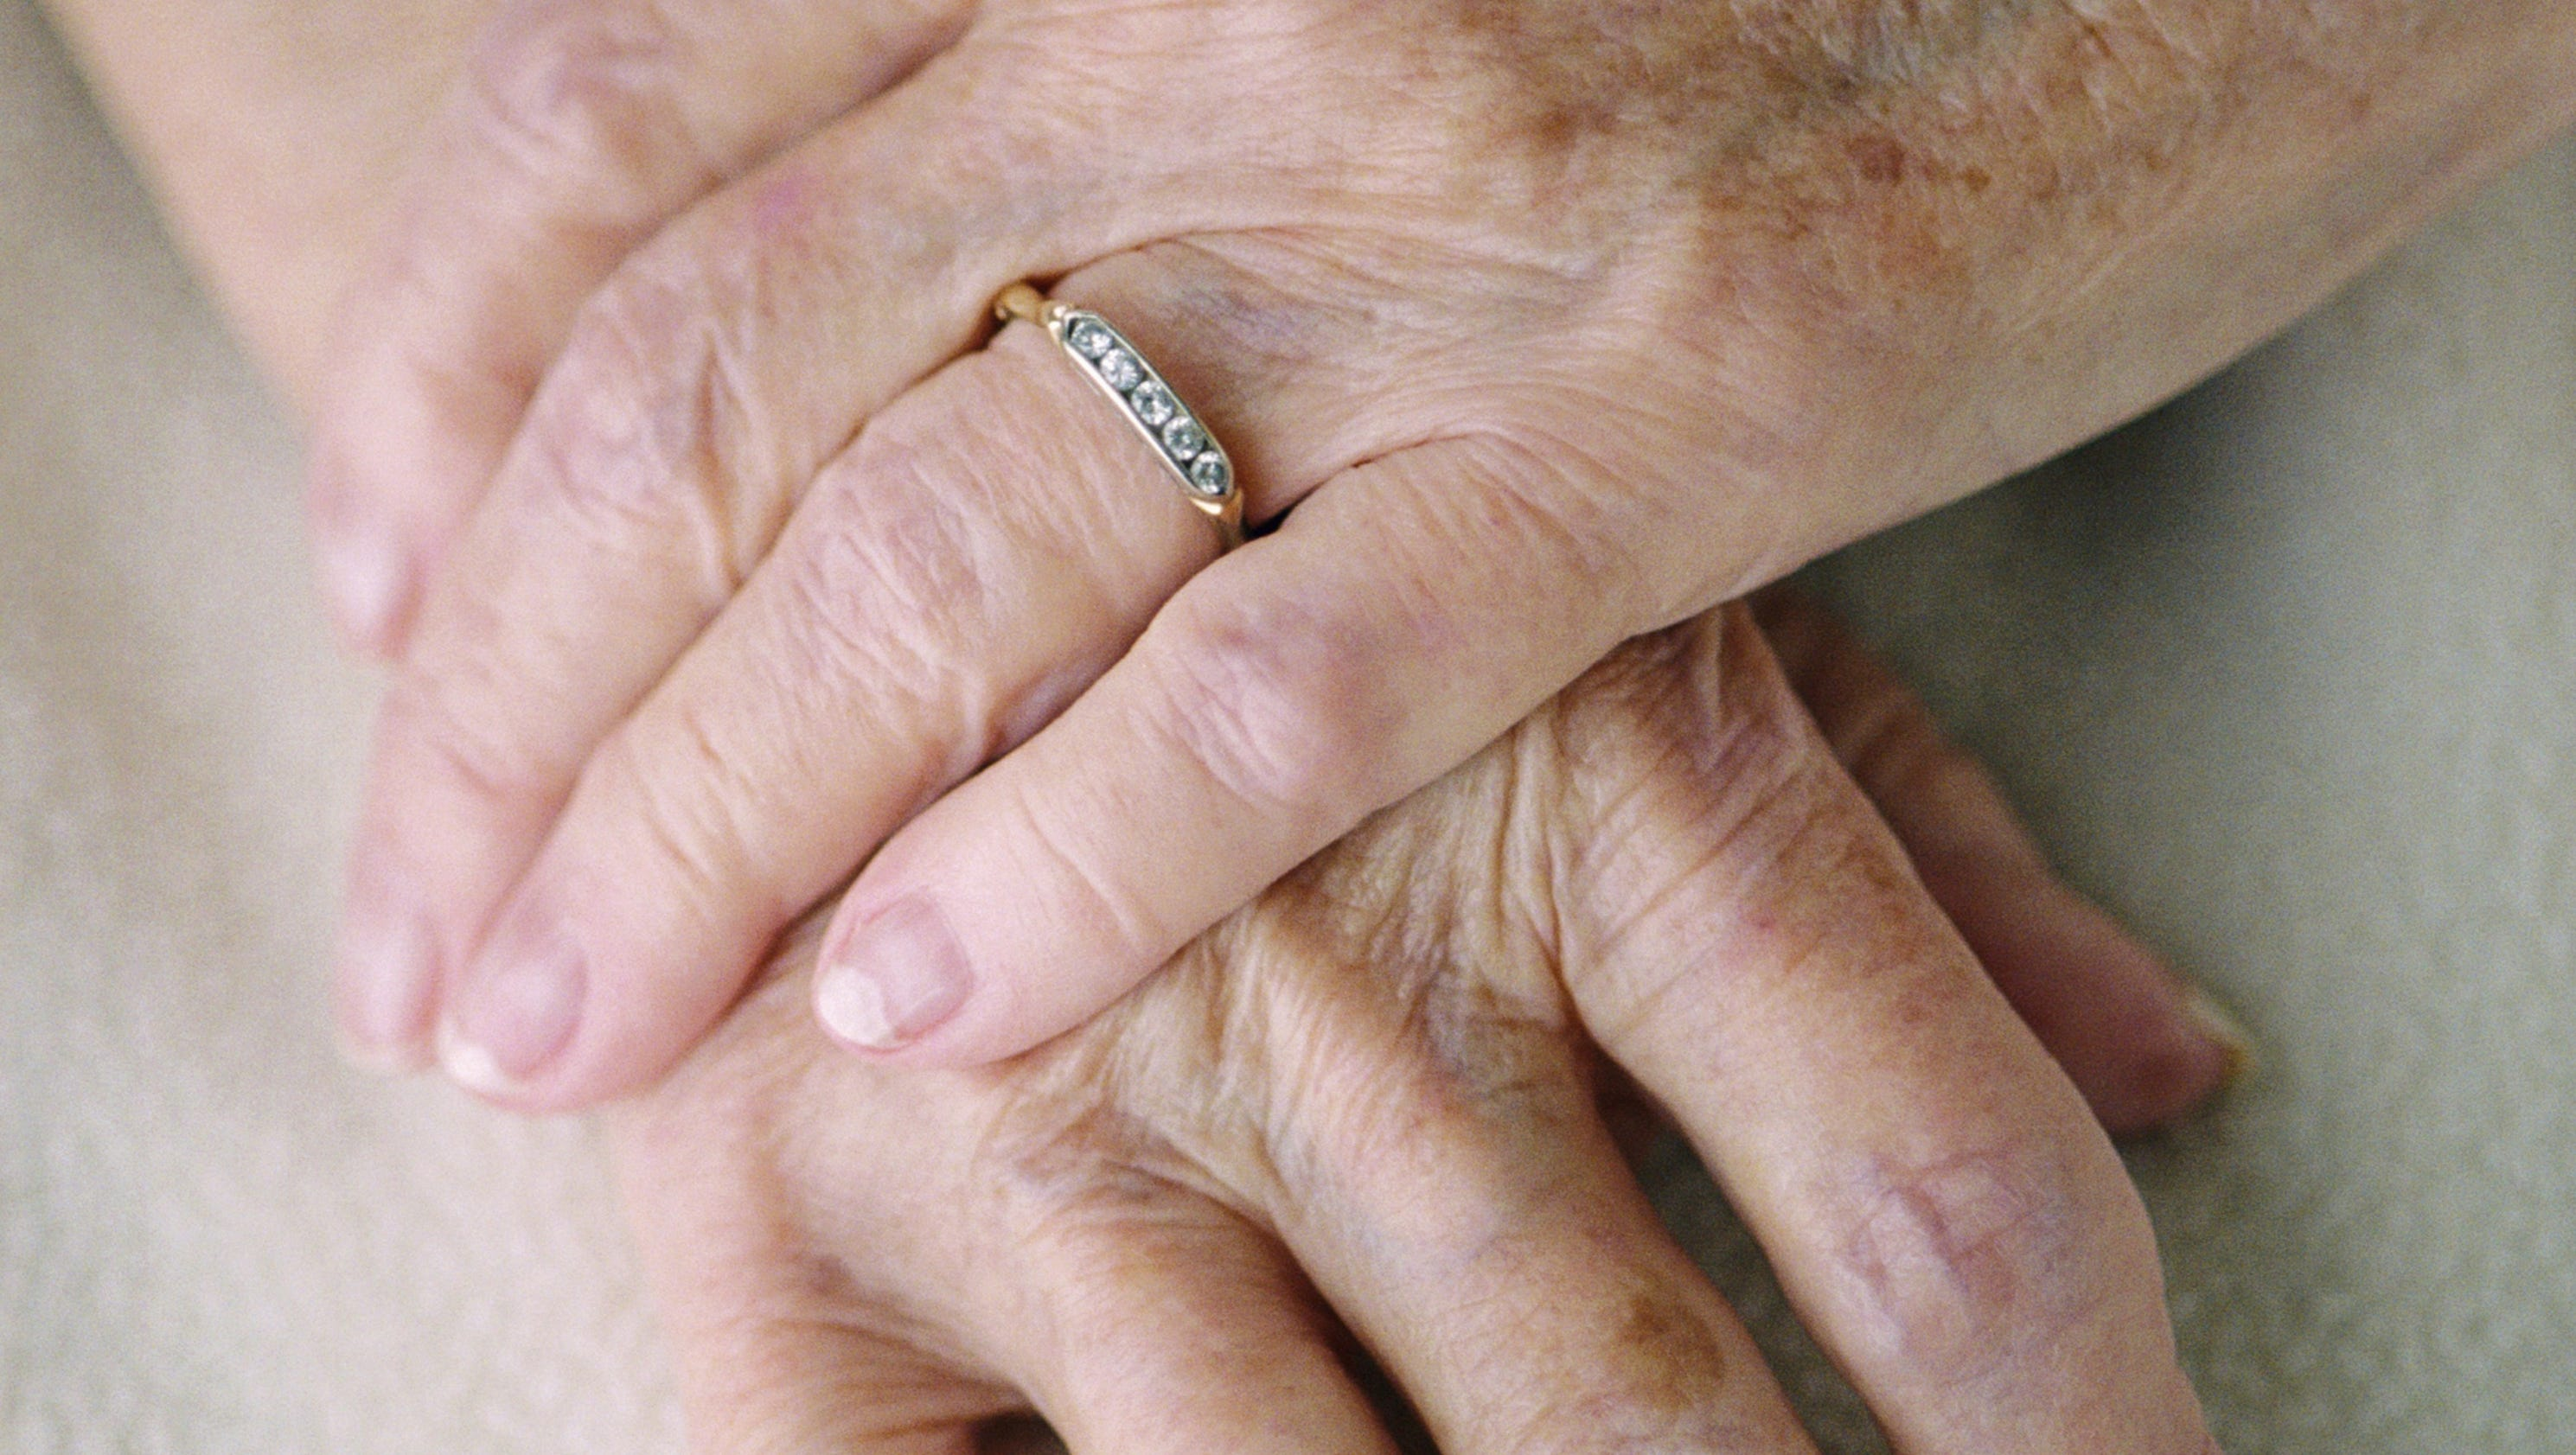 DEATHBED THEFT: Elderly woman\'s wedding ring stolen in hospital